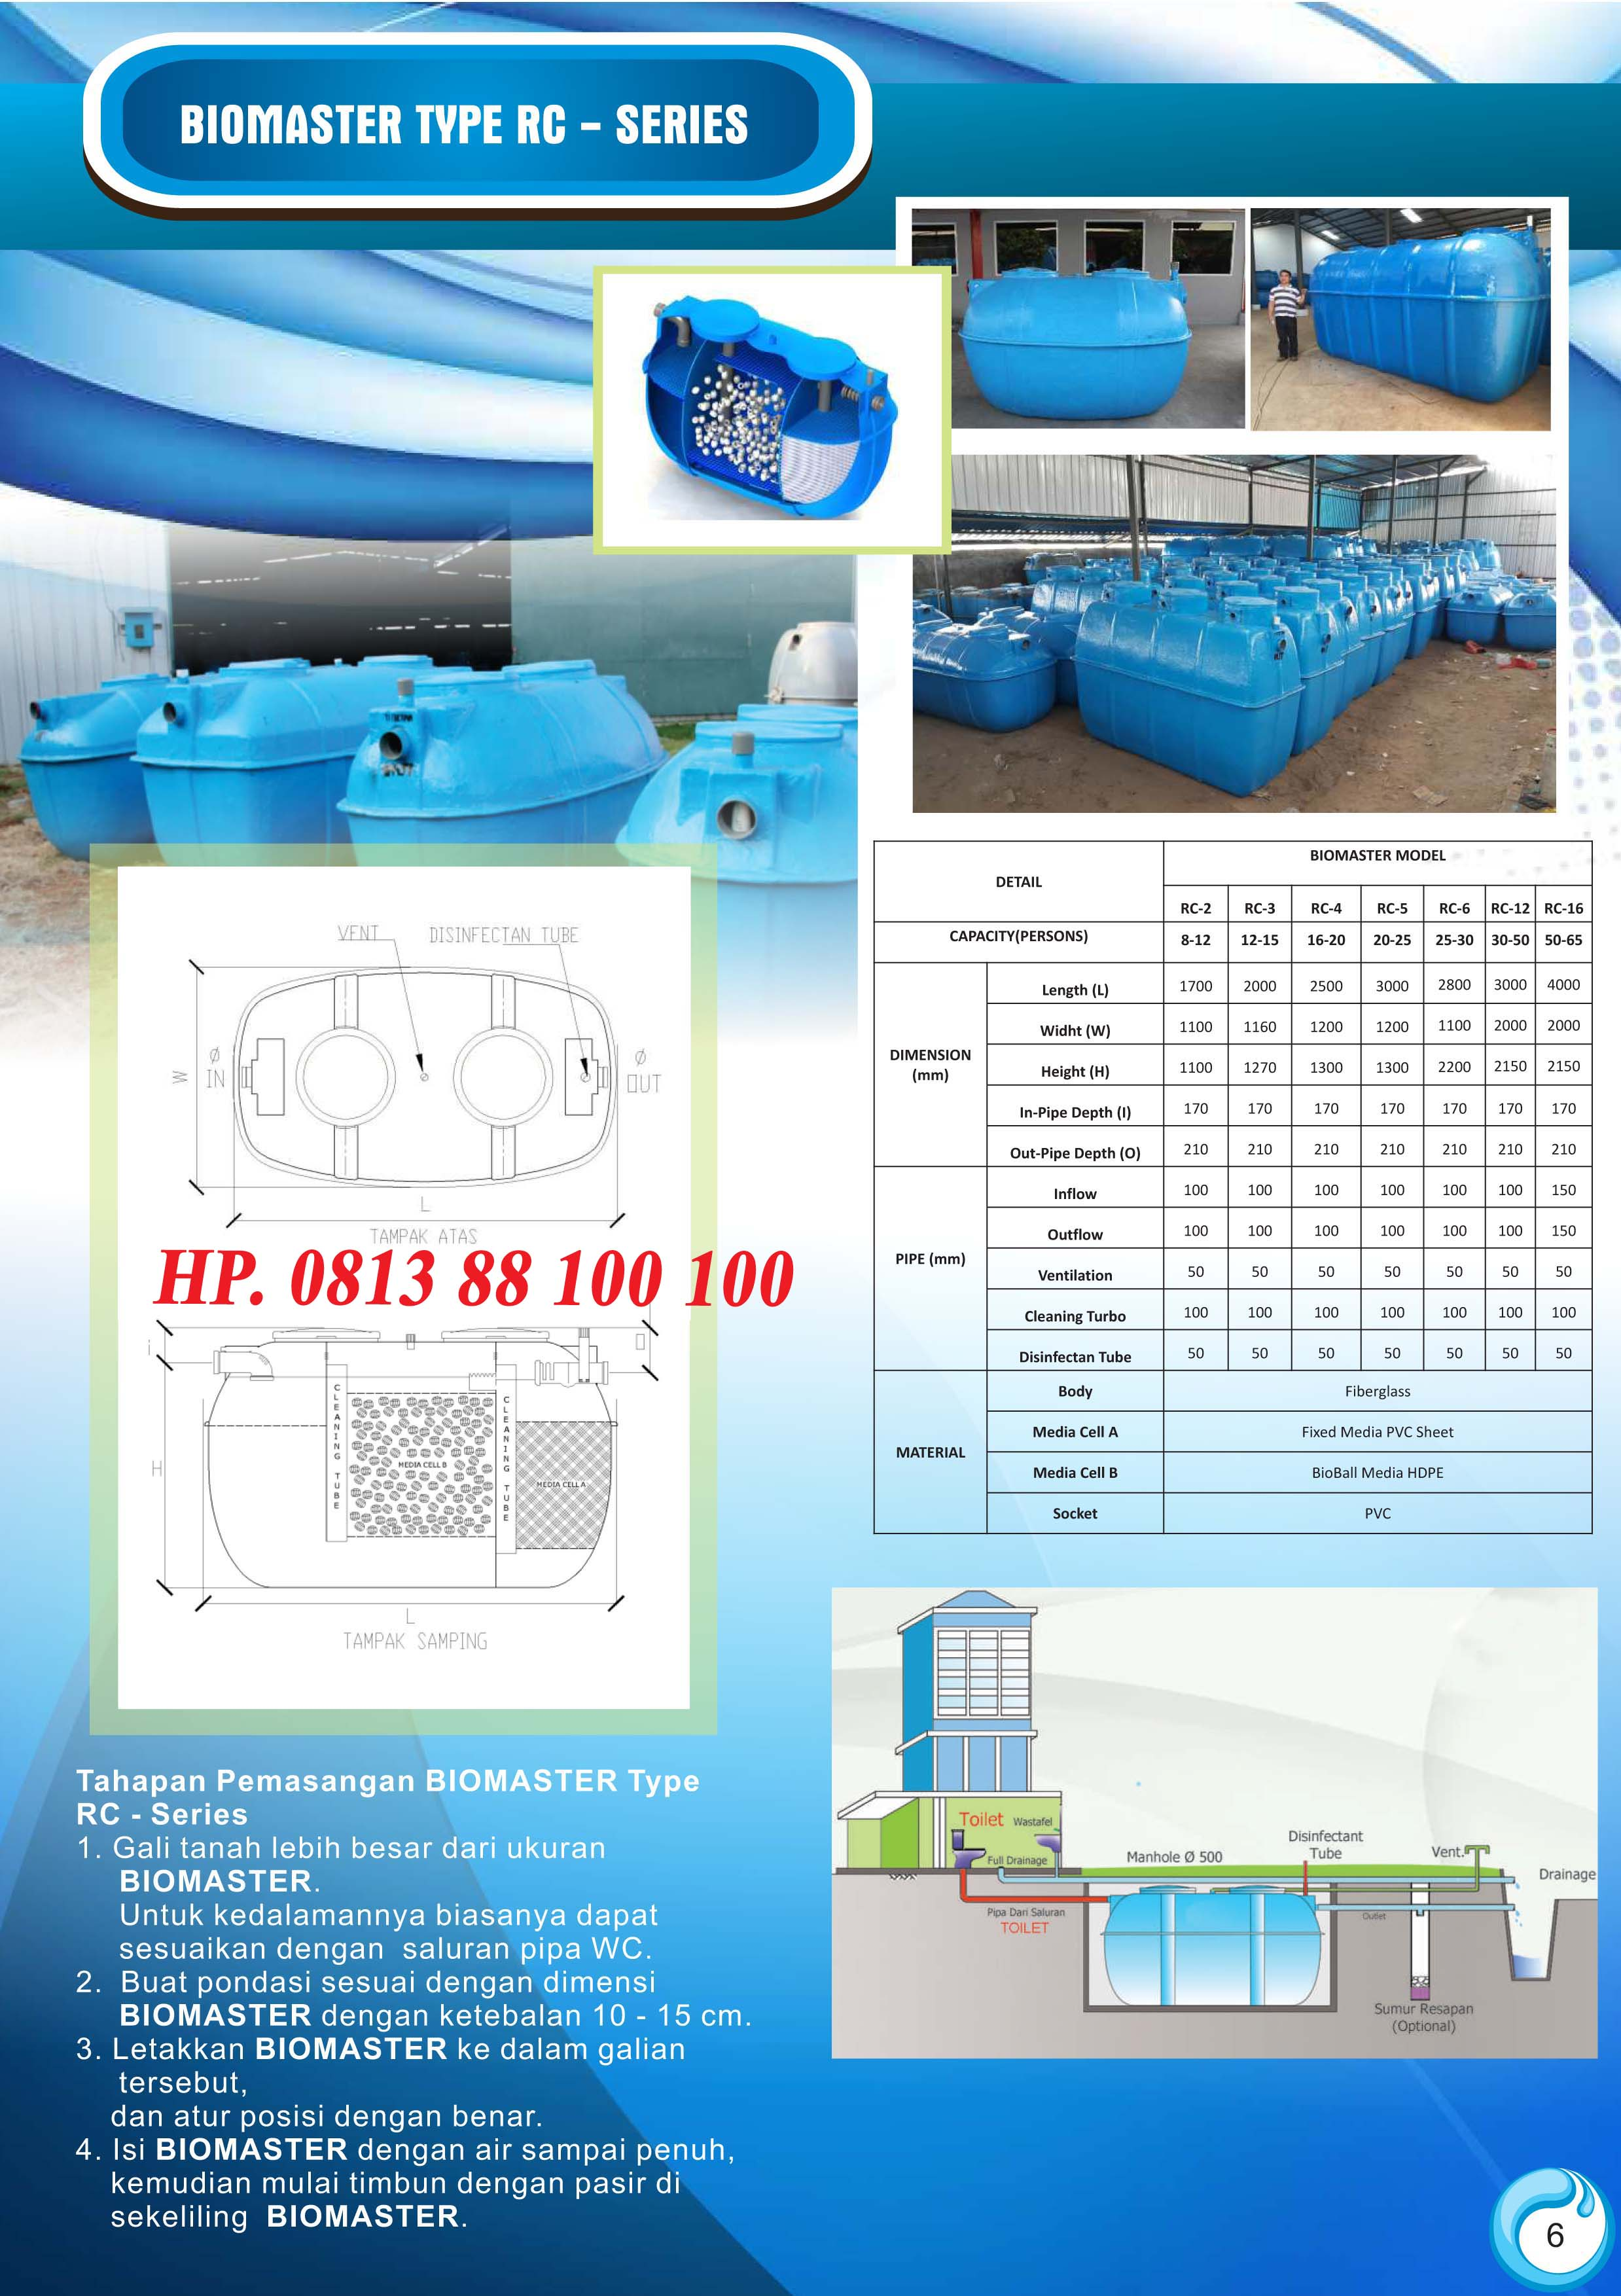 stp biomaster, septic tank, bcr series, bcx, biohome, bio primatech, alam hijau lestari